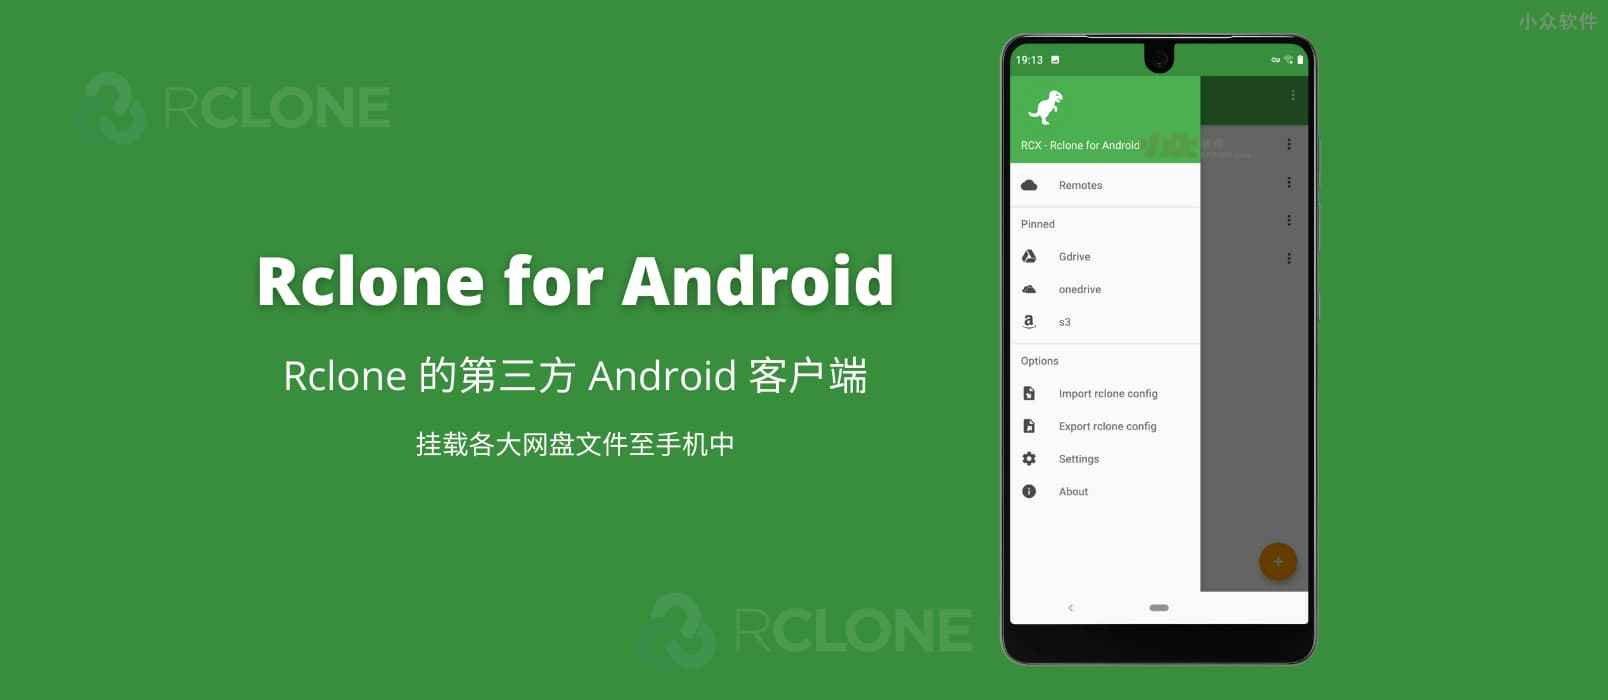 Rclone for Android – 云服务/网盘文件管理工具 Rclone 的 Android 客户端